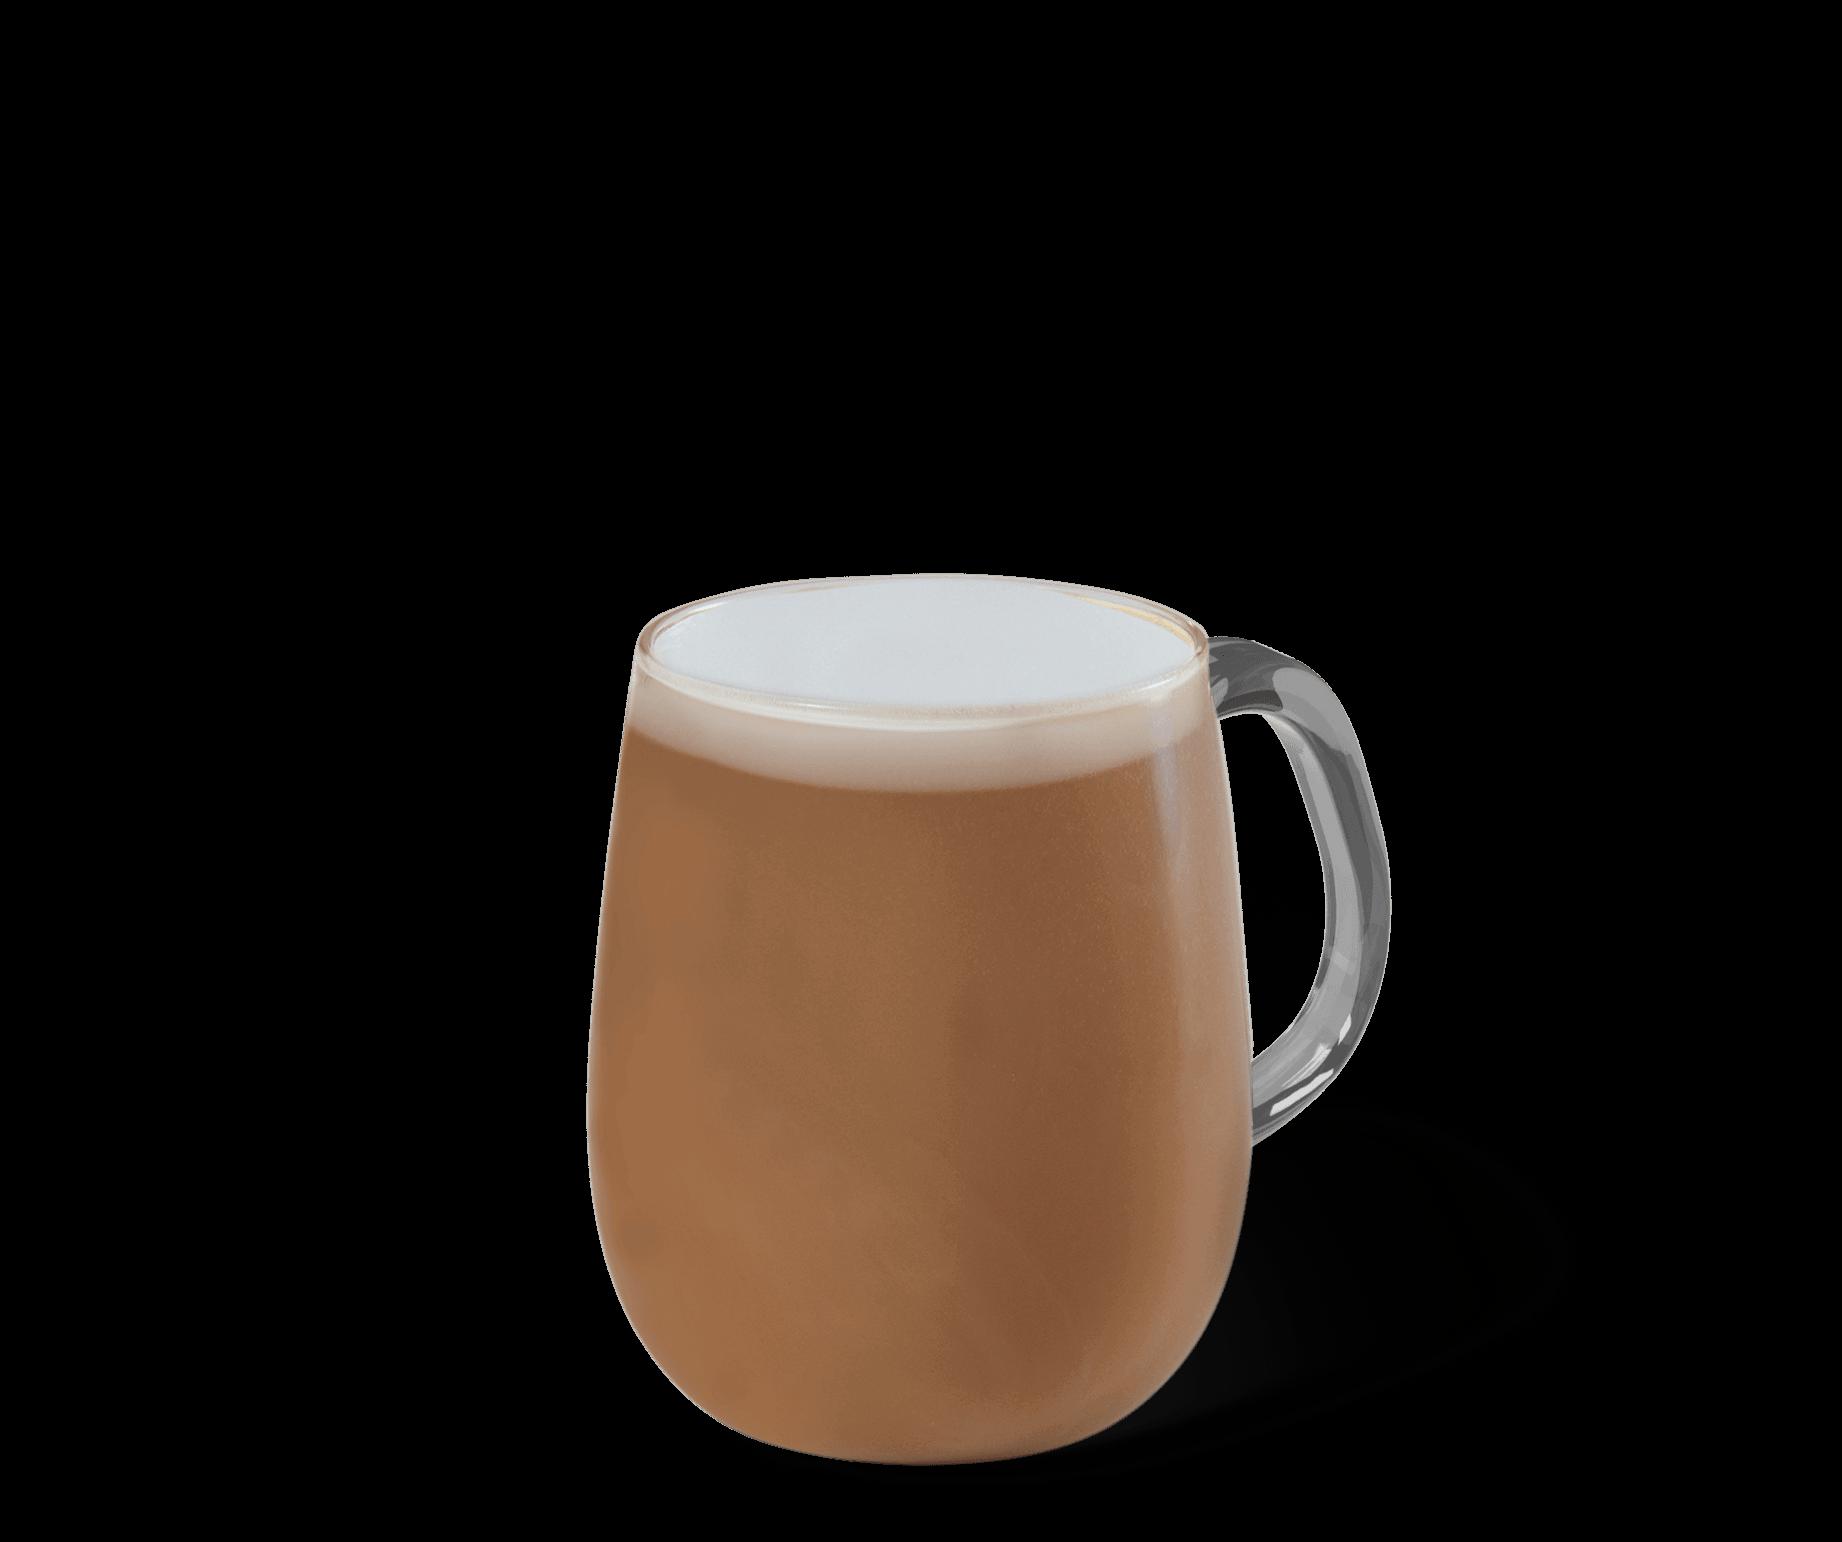 BAB_CAFE_AU_LAIT_LongShadow_Cream.png